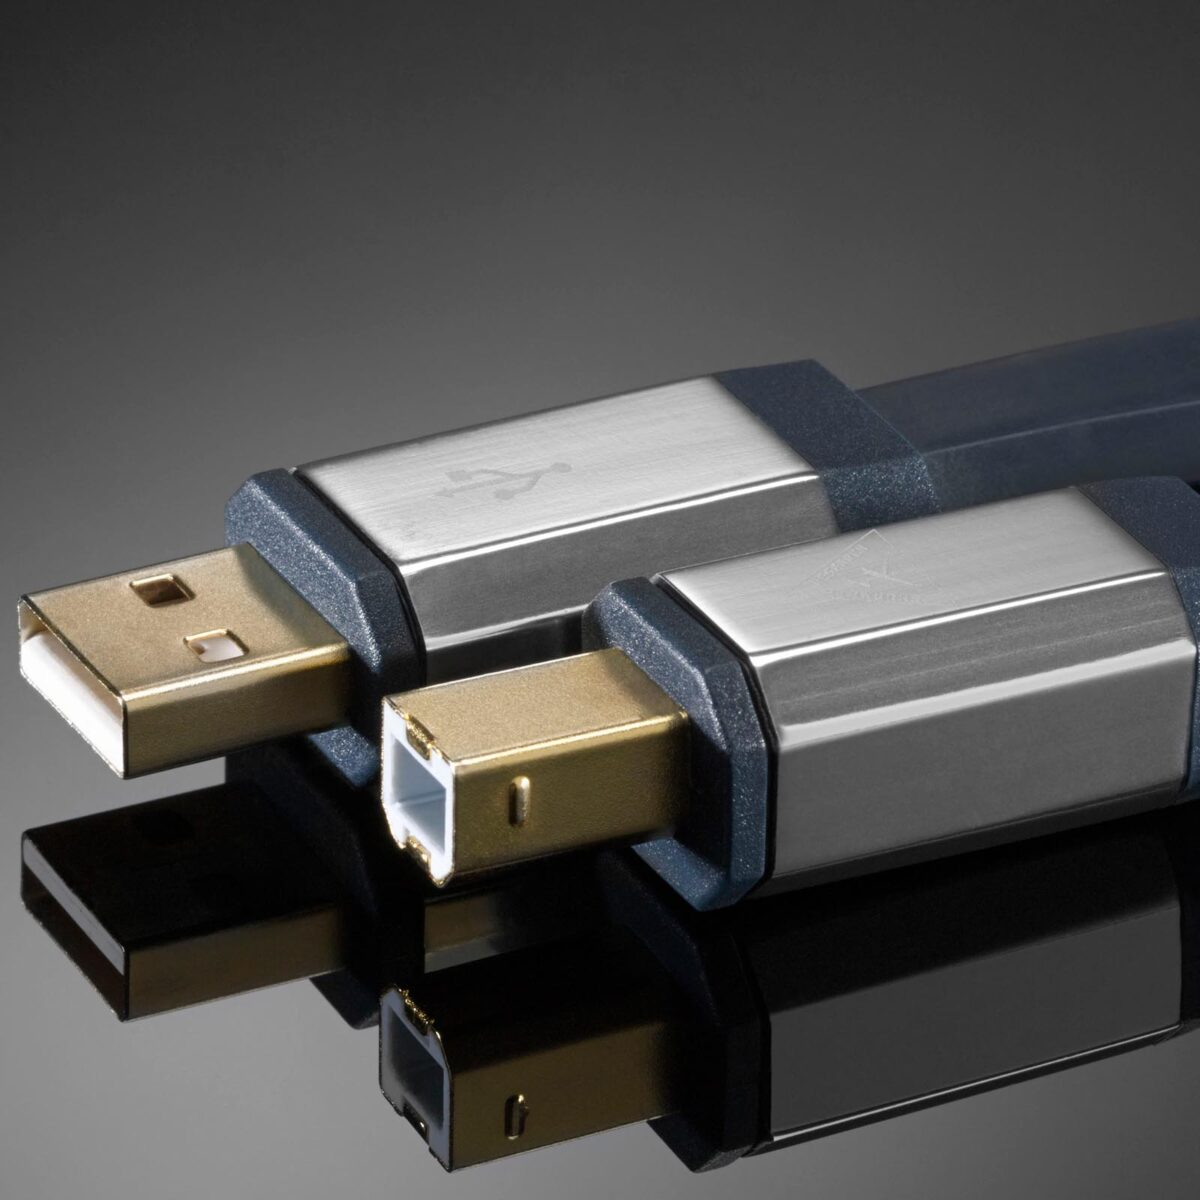 VENOM USB